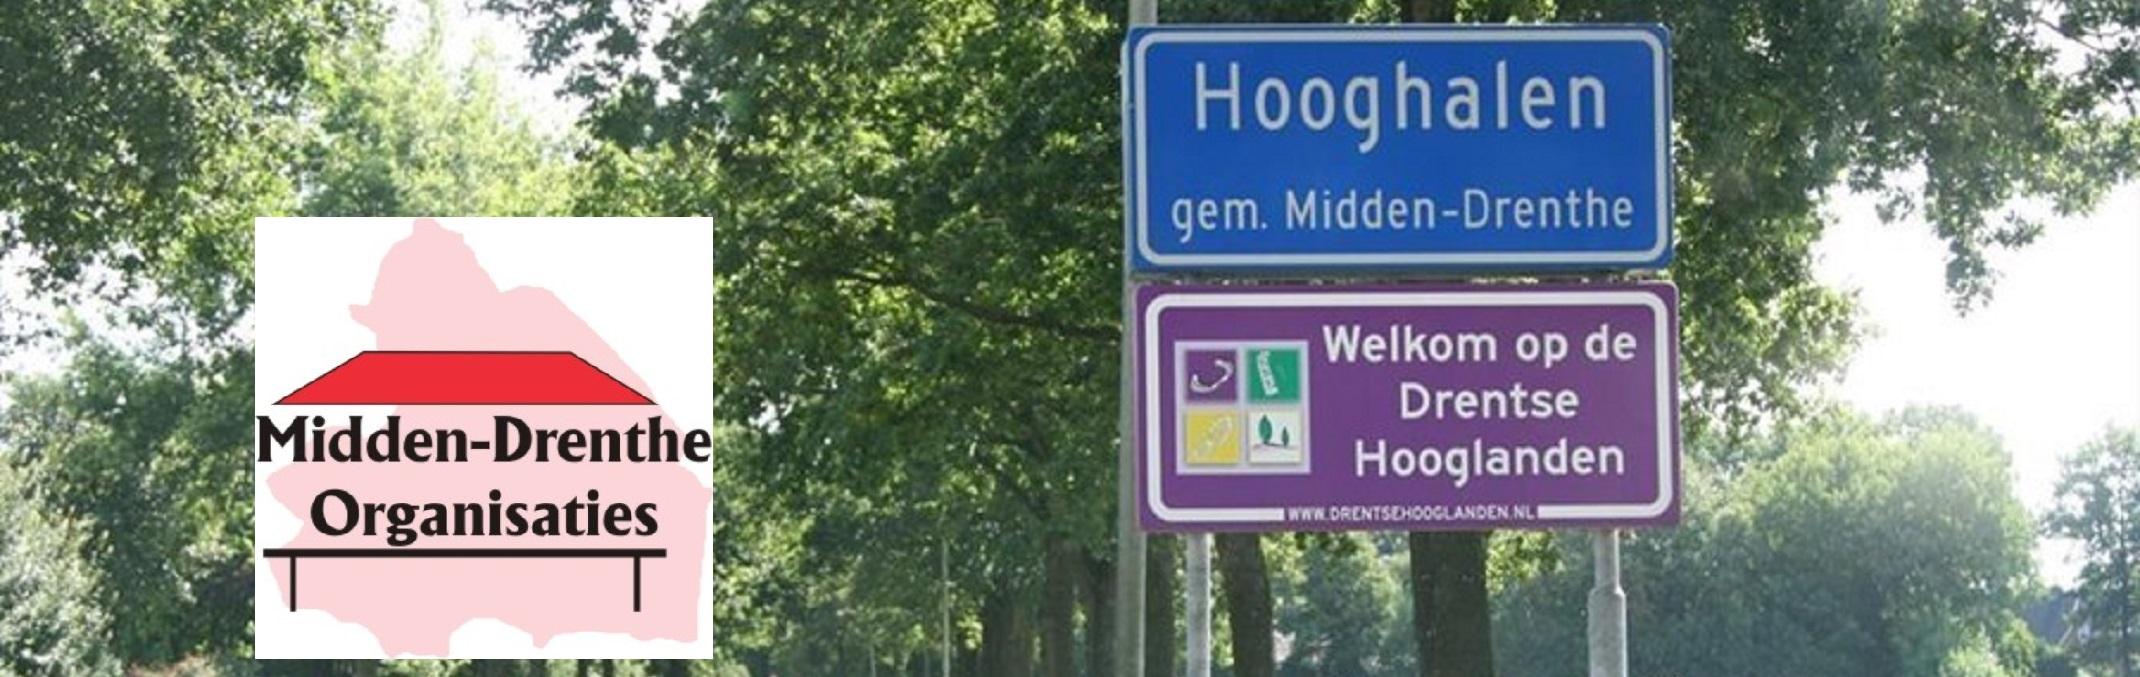 Braderie Hooghalen